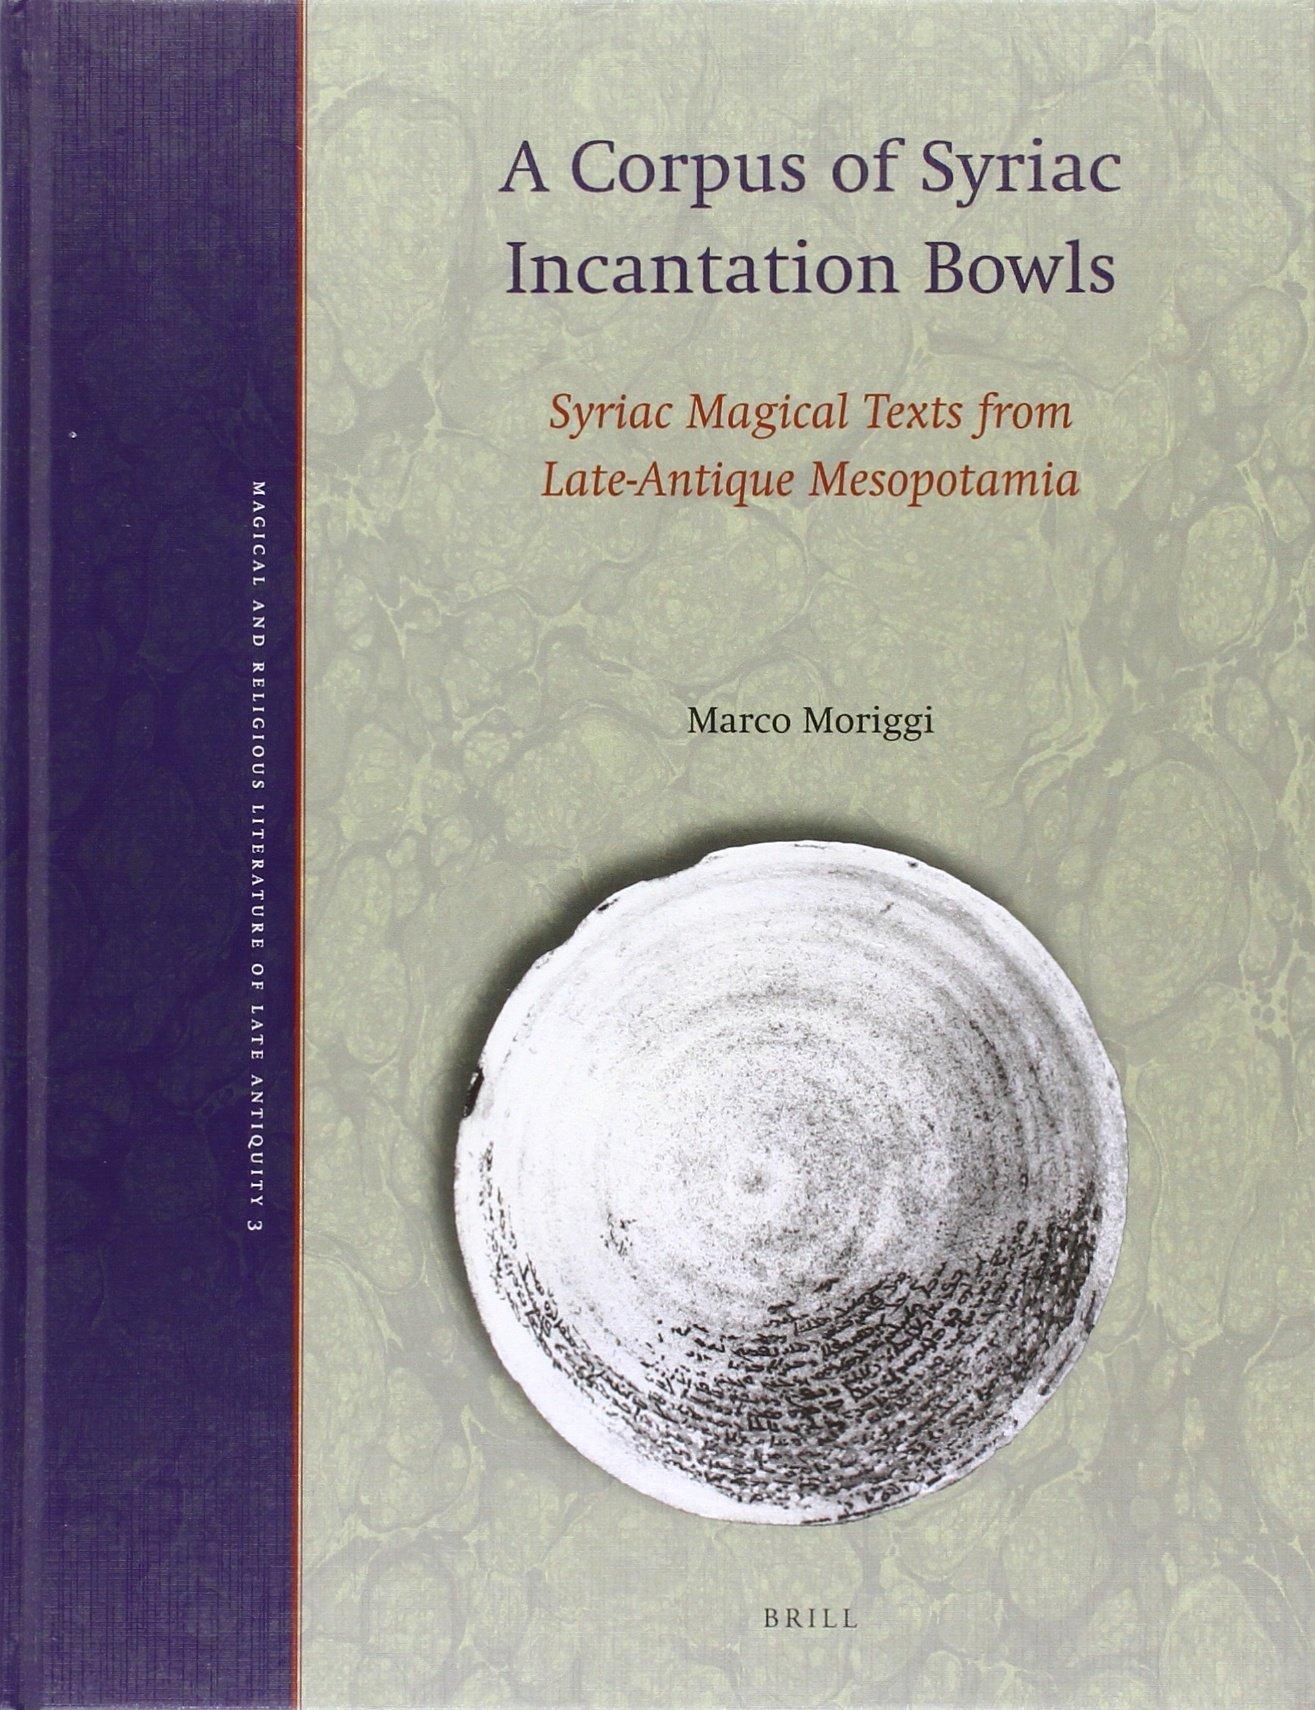 A Corpus of Syriac Incantation Bowls: Syriac Magical Texts